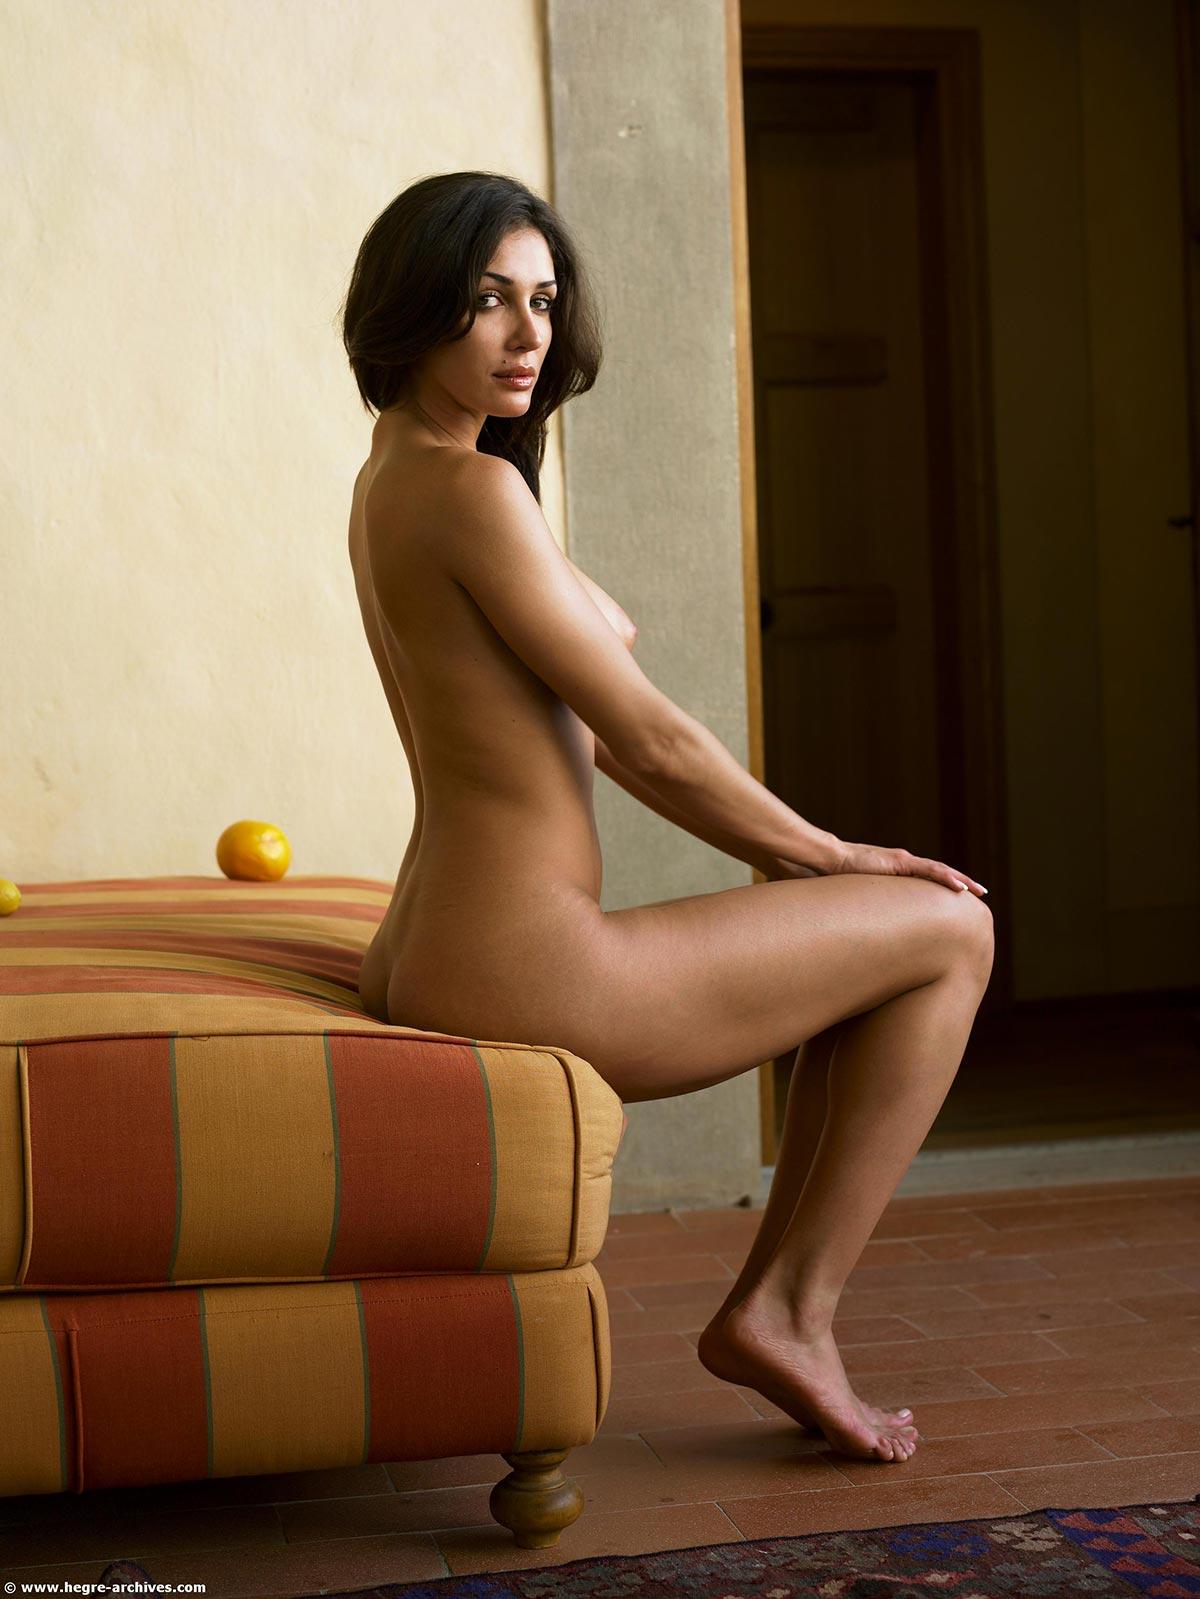 Jennifer ann nude sexy snapchat